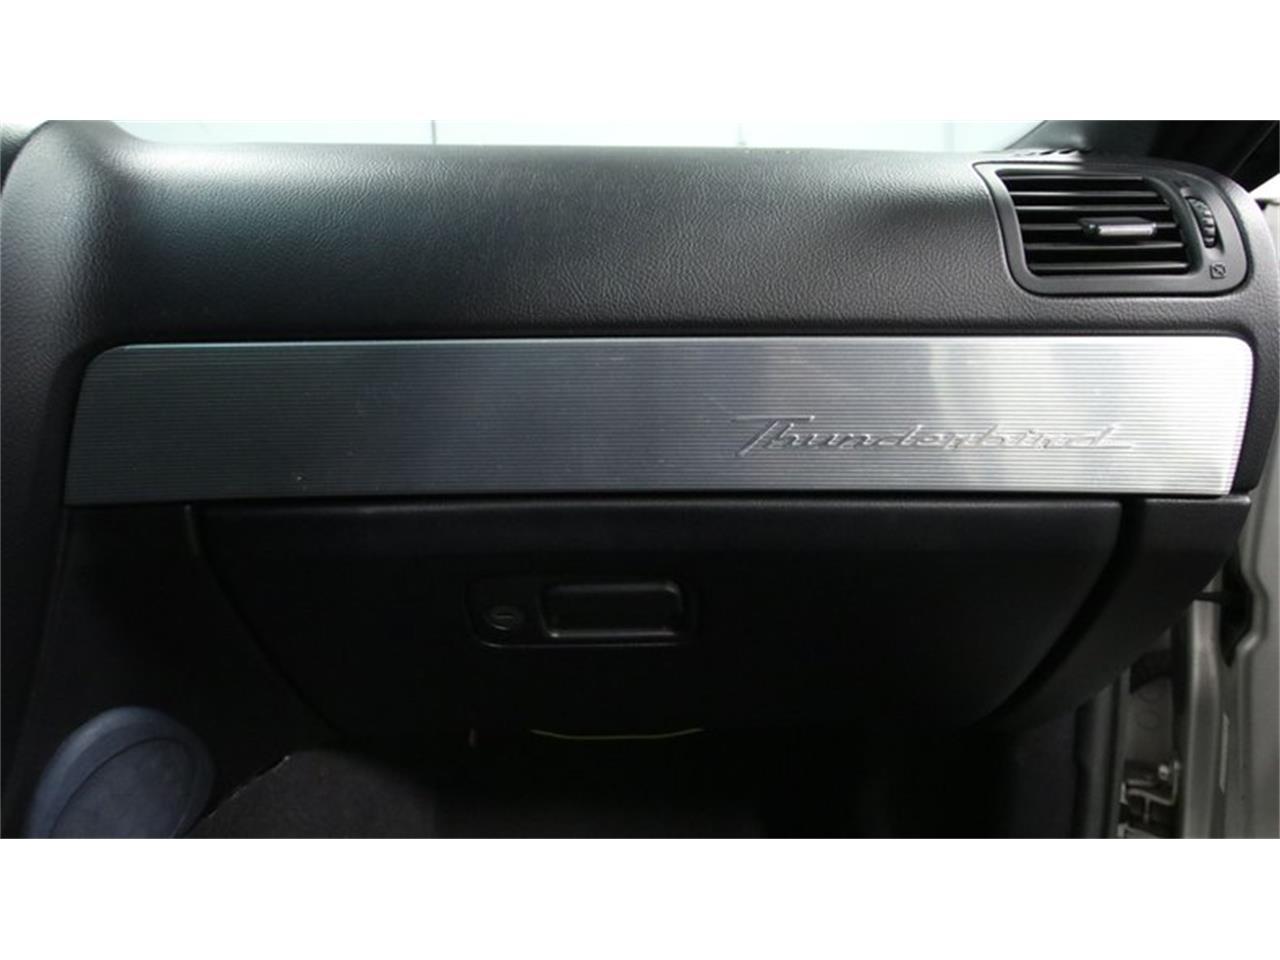 2004 Ford Thunderbird (CC-1361267) for sale in Lithia Springs, Georgia